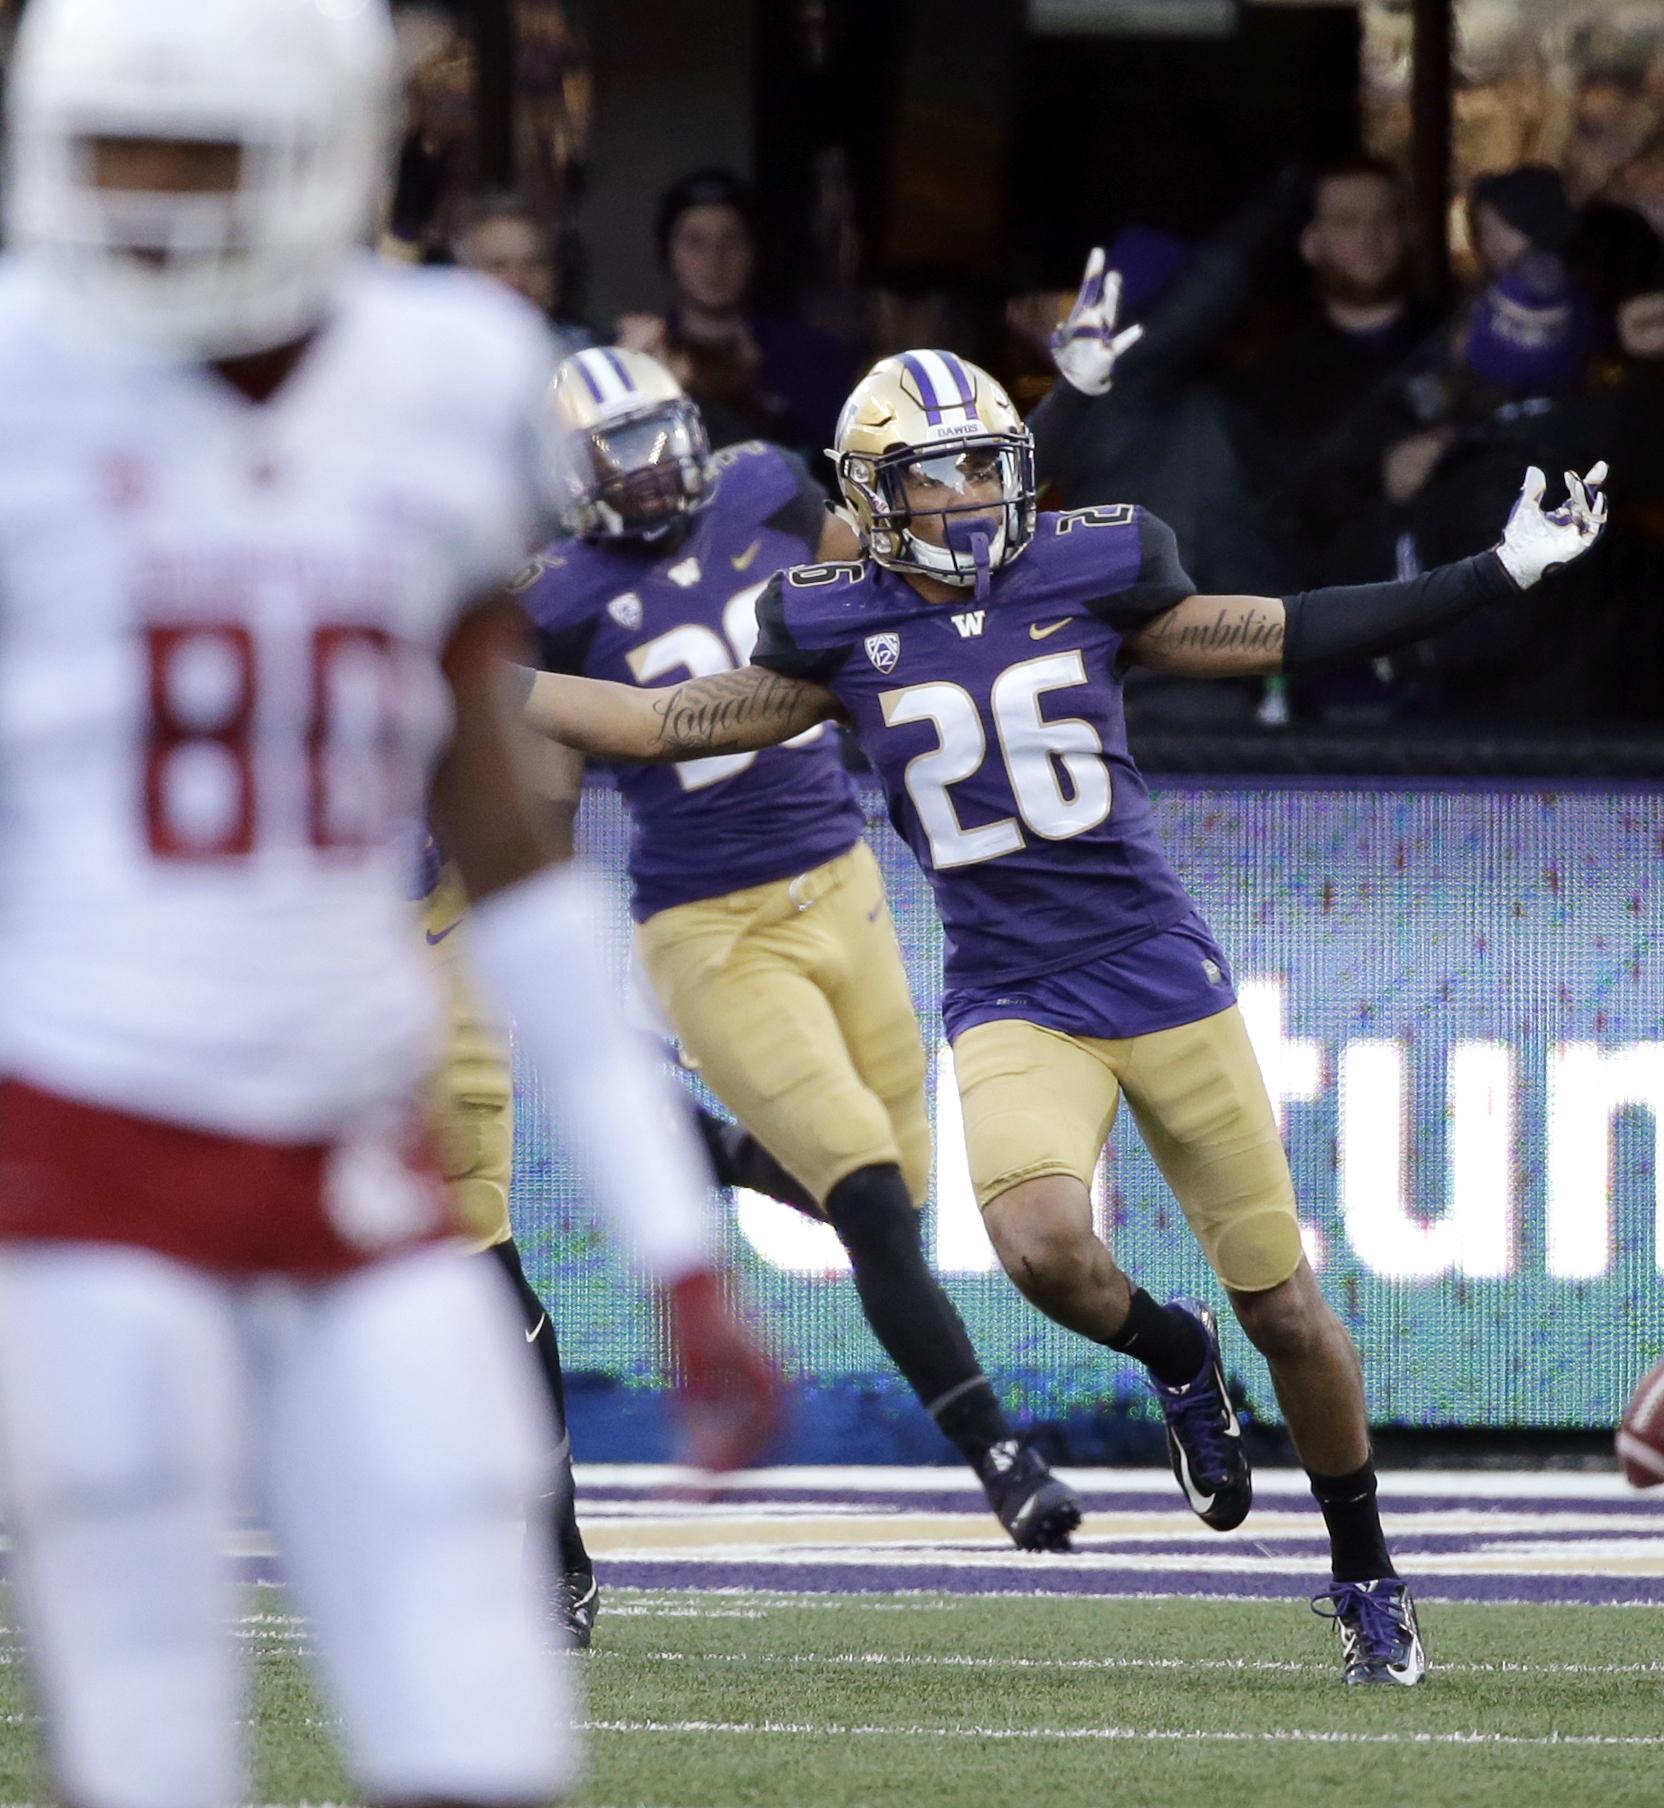 FILE -- In this Nov. 27, 2015, file photo, Washington's Sidney Jones celebrates scoring a touchdown on an interception against Washington State in an NCAA college football game in Seattle. (AP Photo/Elaine Thompson, File)